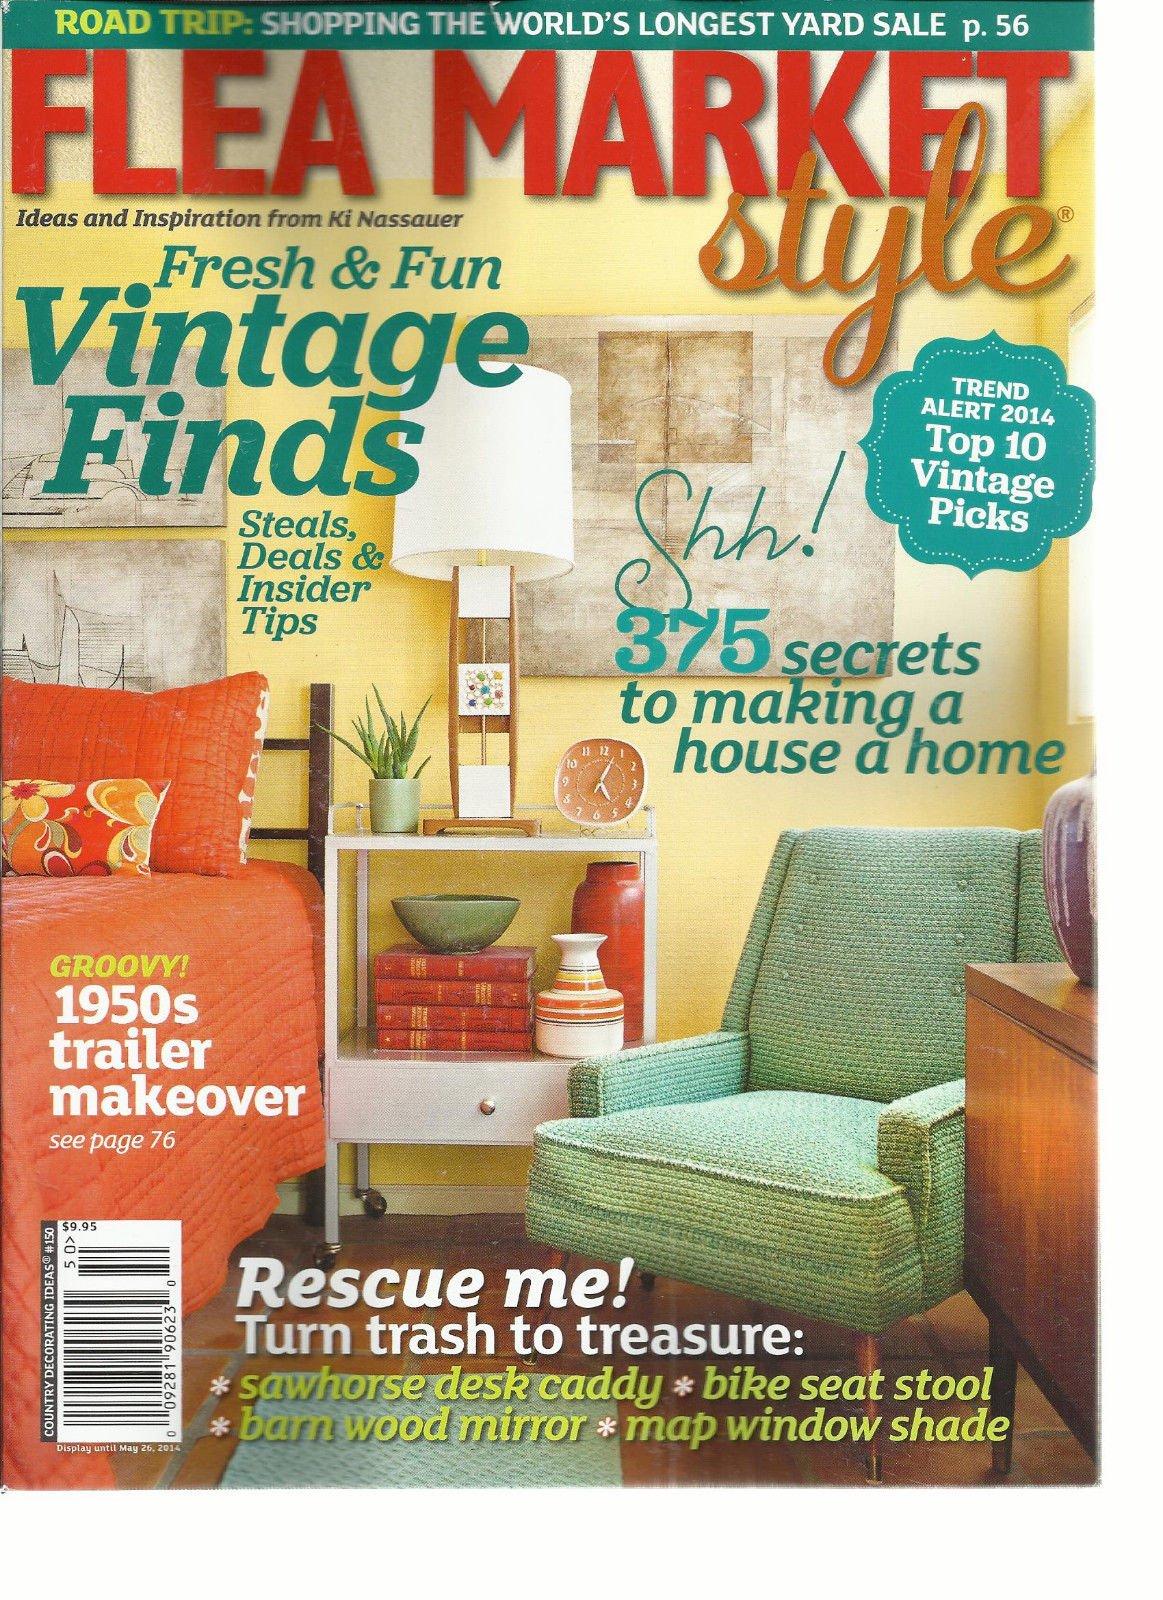 FLEA MARKET STYLE,COUNTRY DECORATING IDEAS # 150 ISSUE, 2014 (FRESH & FUN